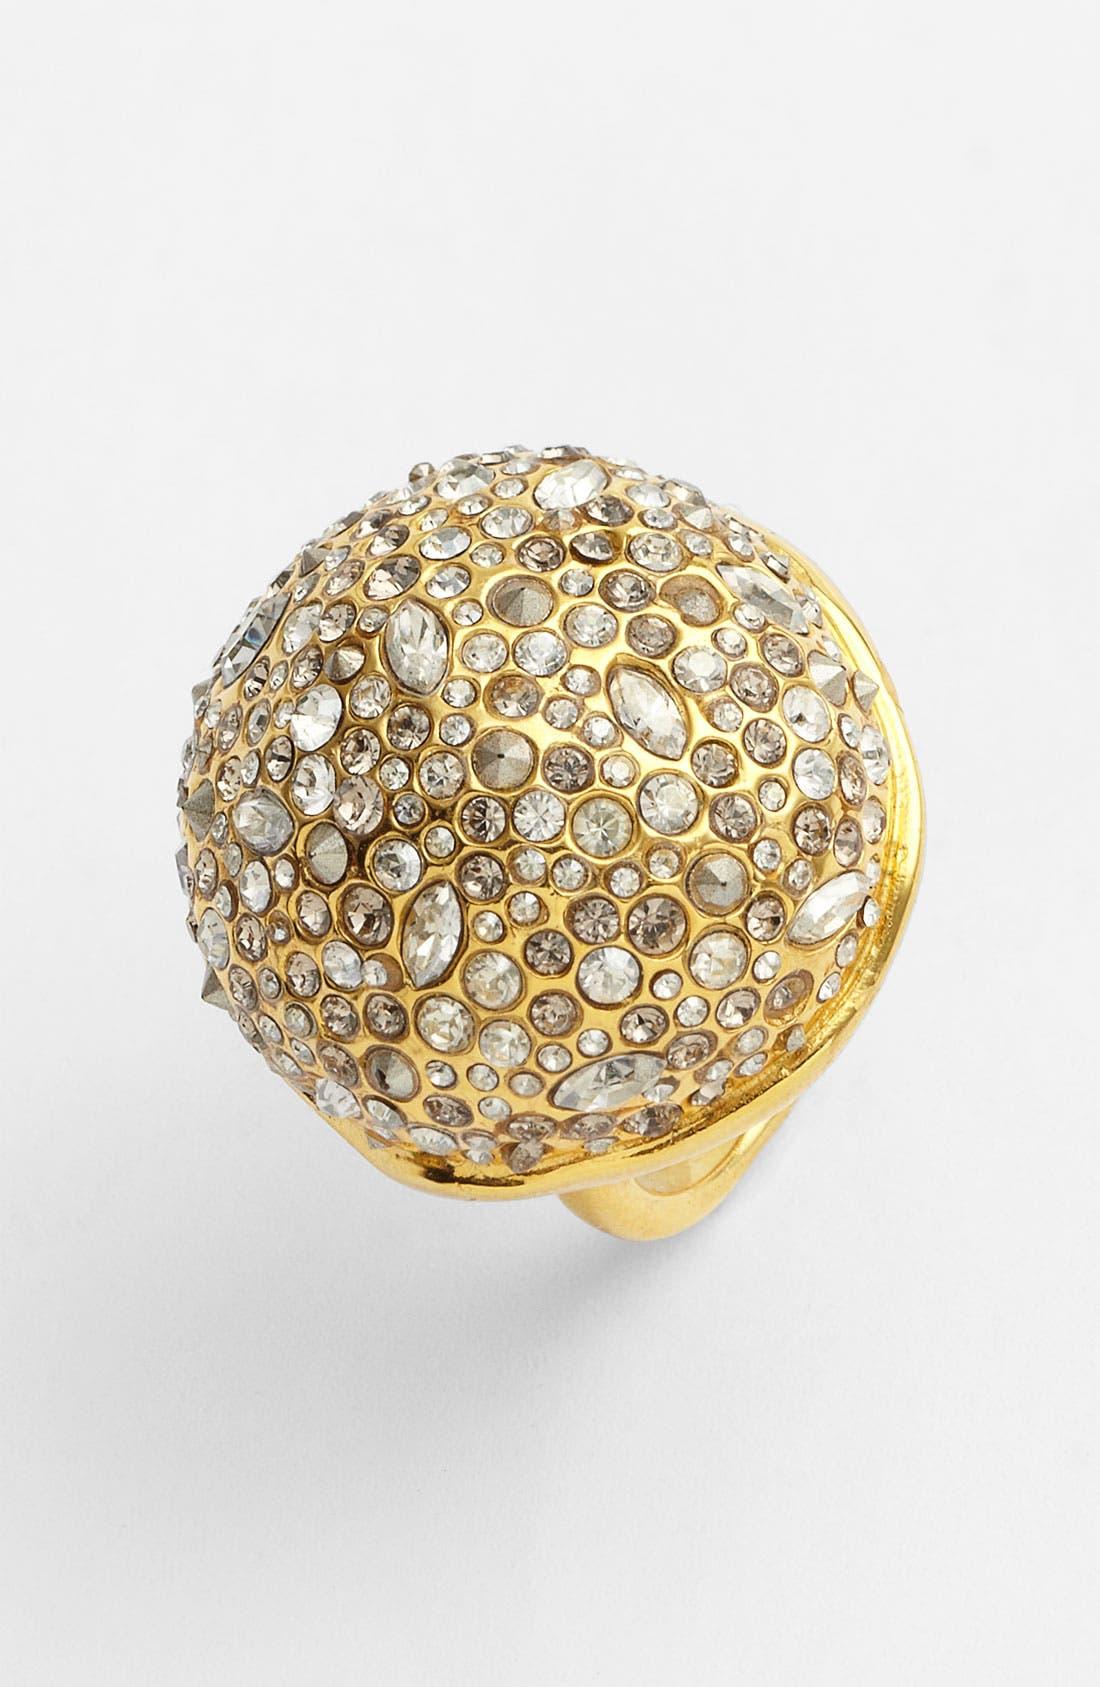 Main Image - Alexis Bittar 'Miss Havisham' Crystal Encrusted Sphere Ring